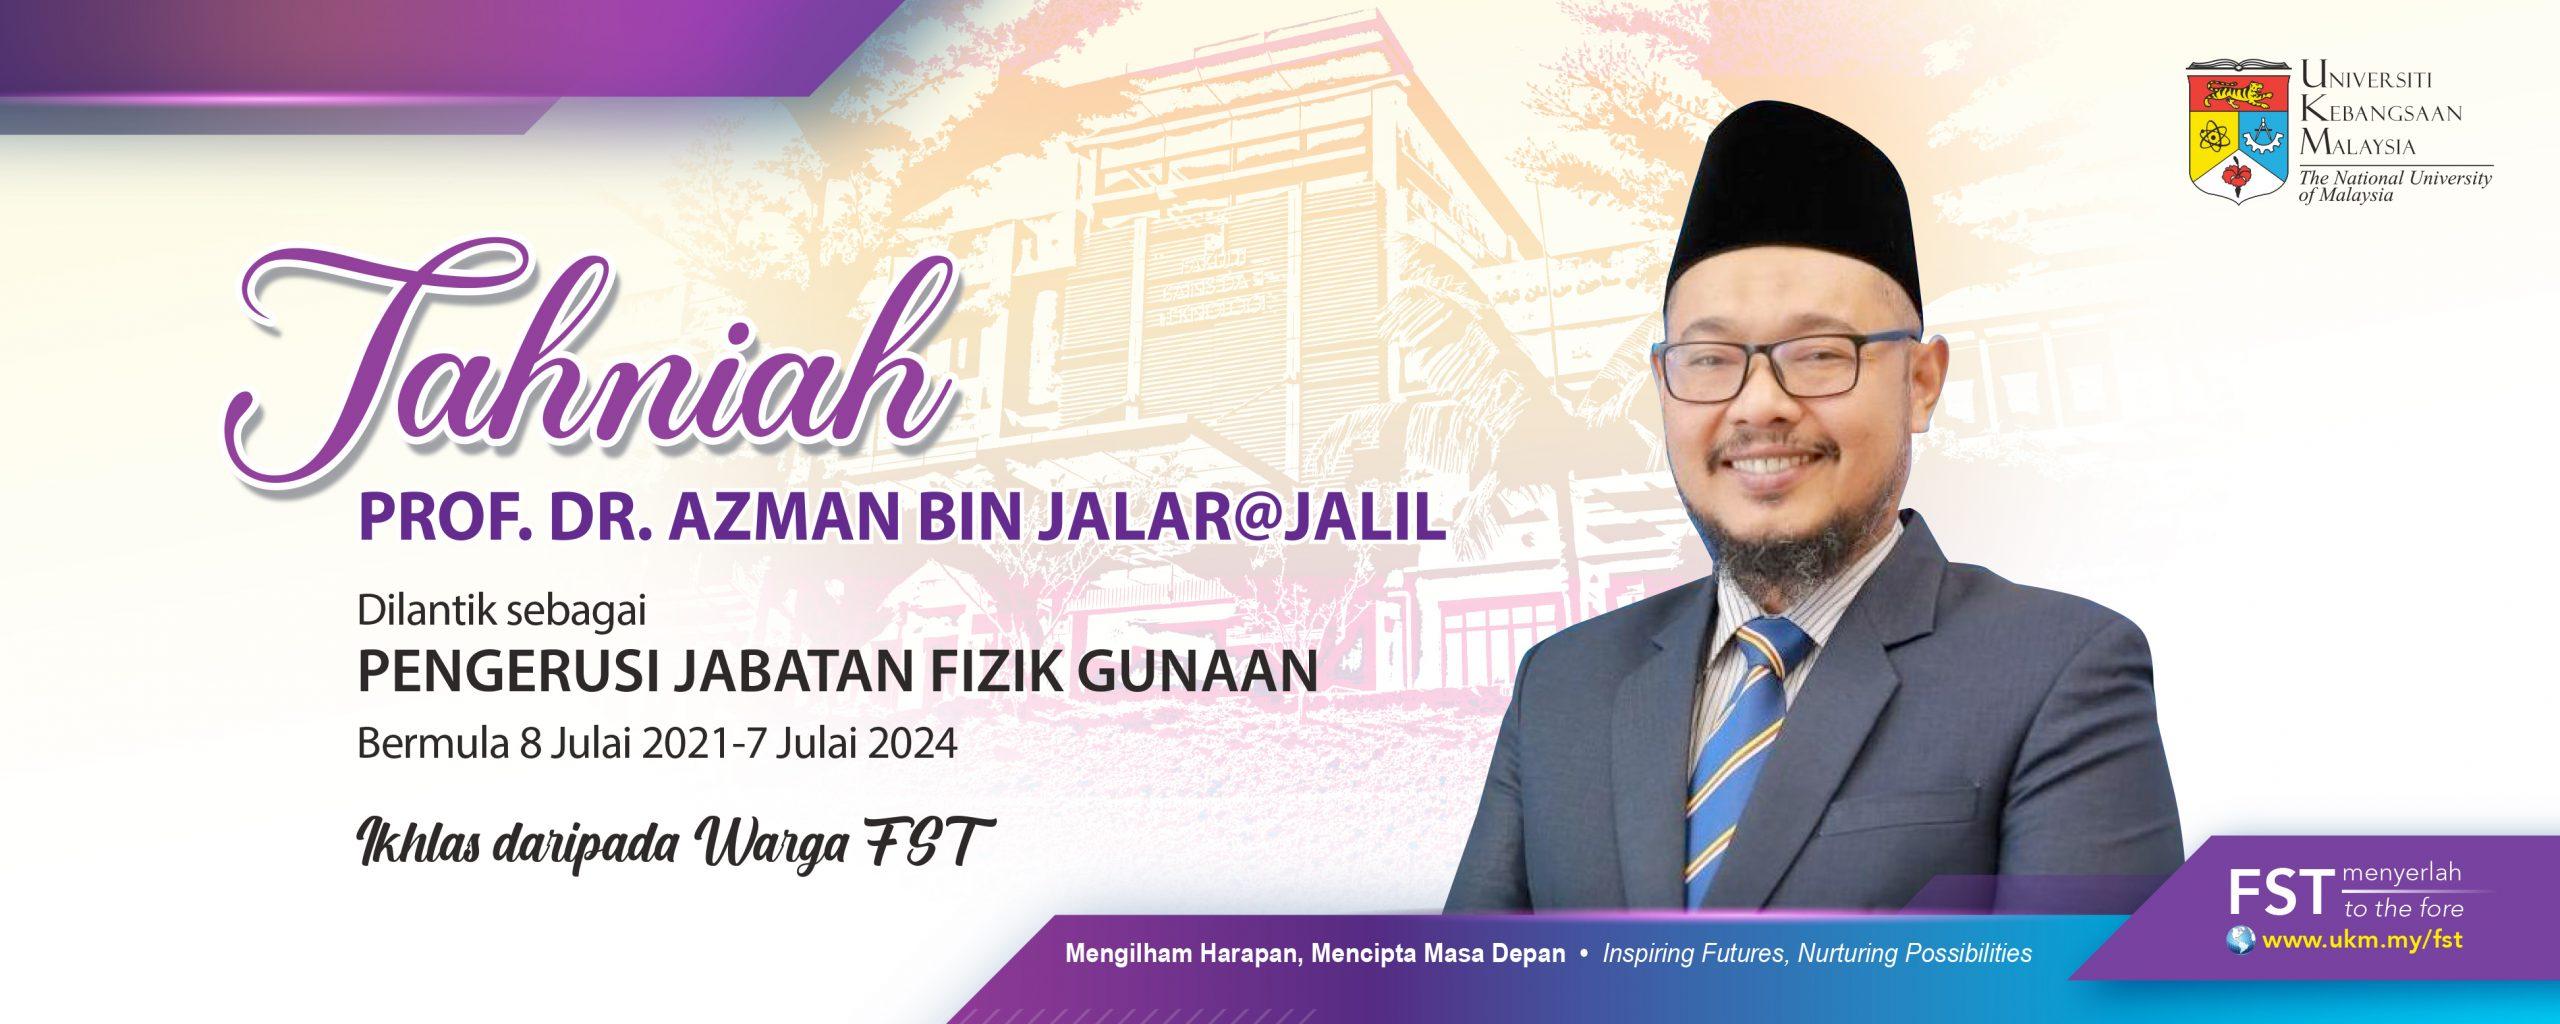 Tahniah Prof Azman